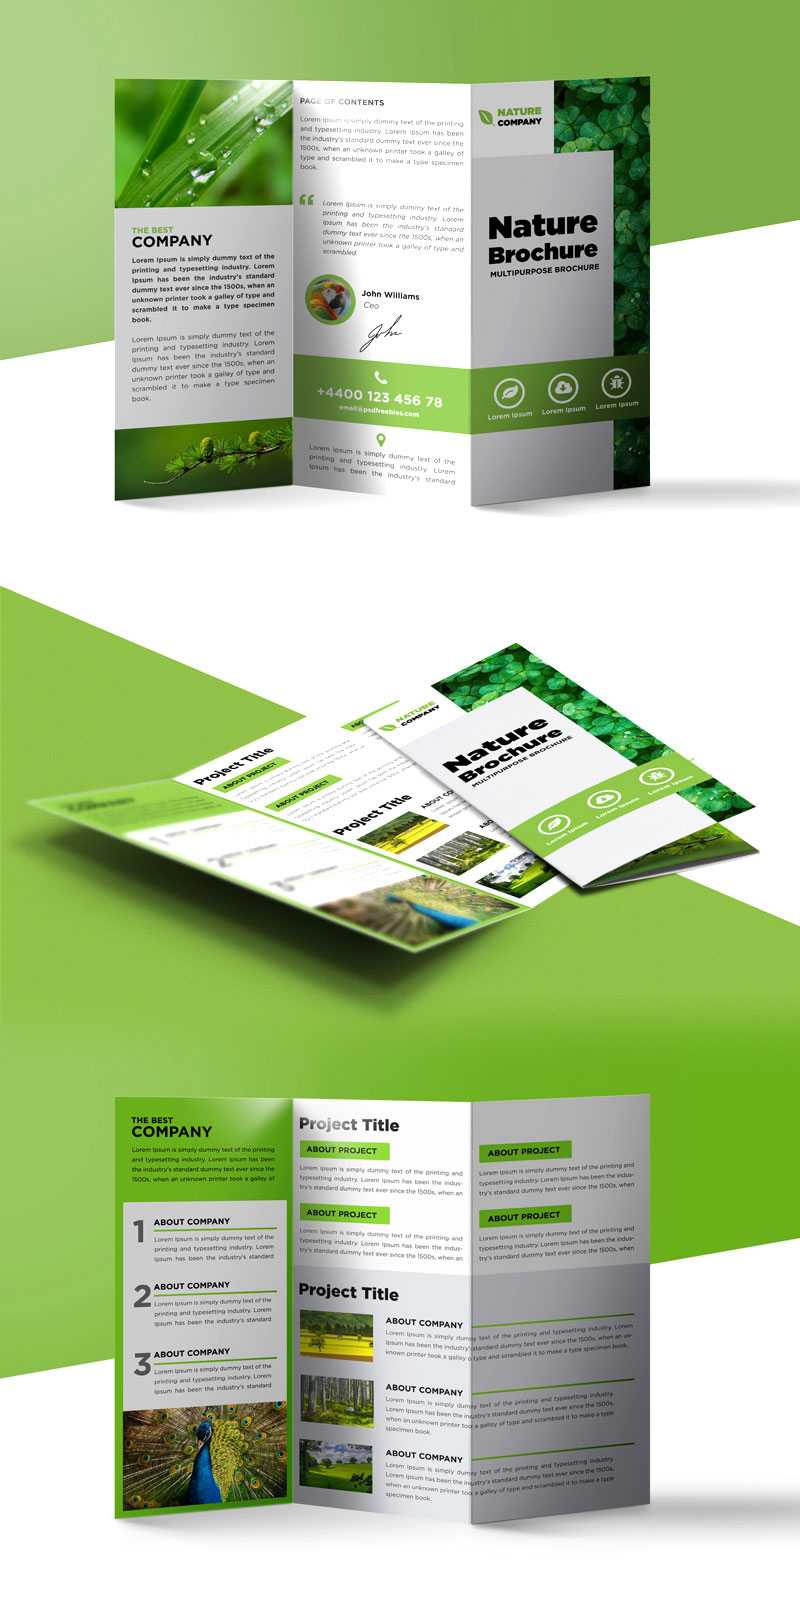 Tri Fold Brochure Template A4 Free #1502 with regard to Free Three Fold Brochure Template